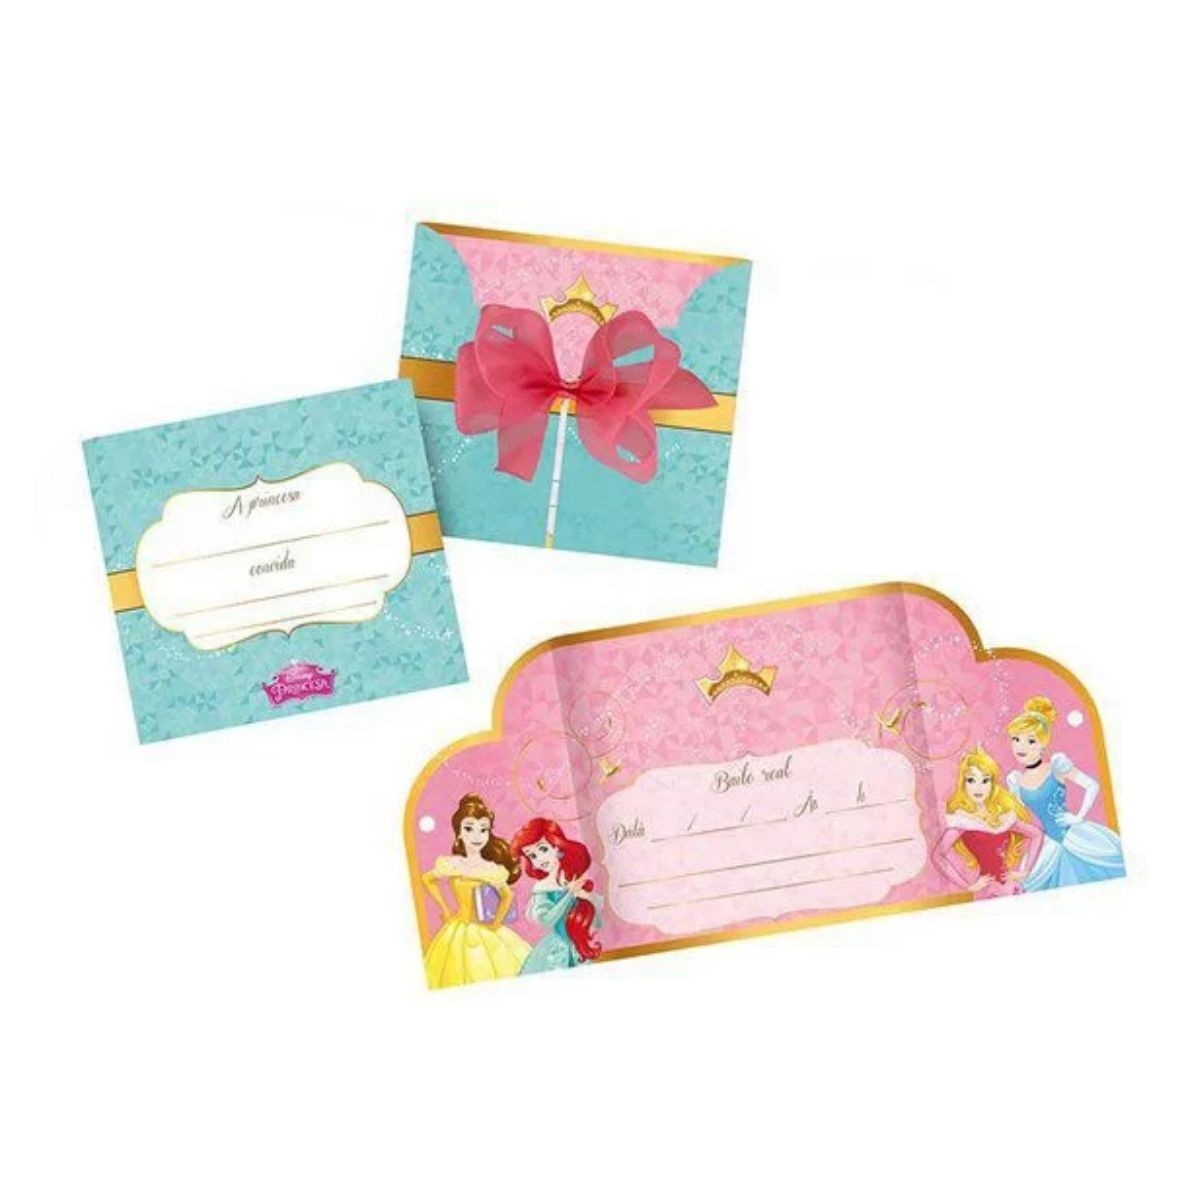 Convite Grande Disney Princesa com 8 unidades